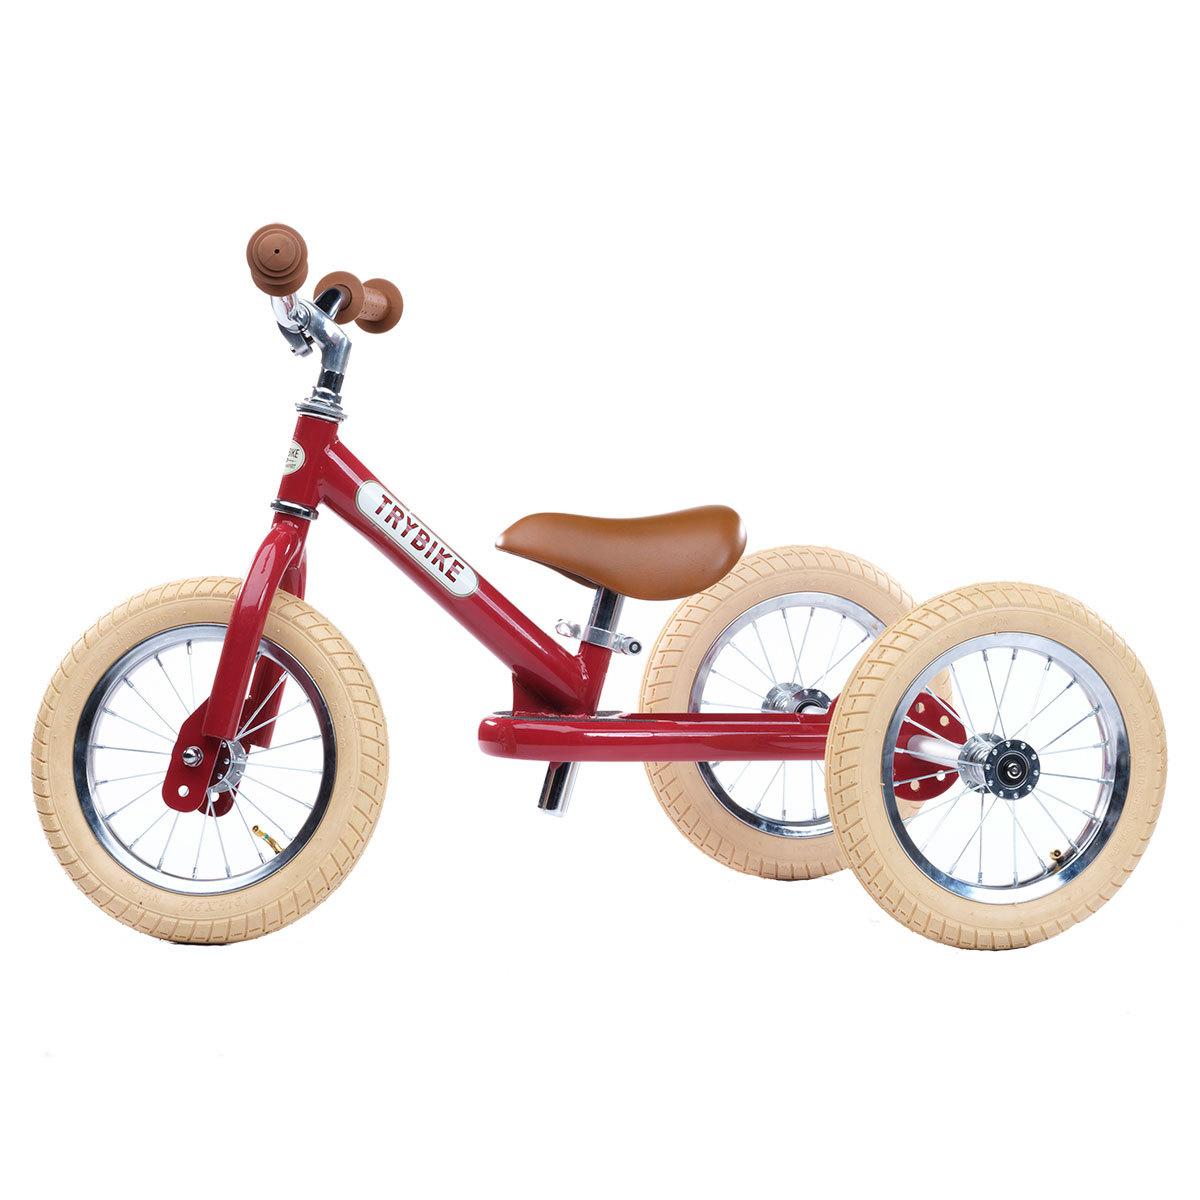 Trotteur & Porteur Trybike 2 en 1 - Vintage Rouge Trybike 2 en 1 - Vintage Rouge